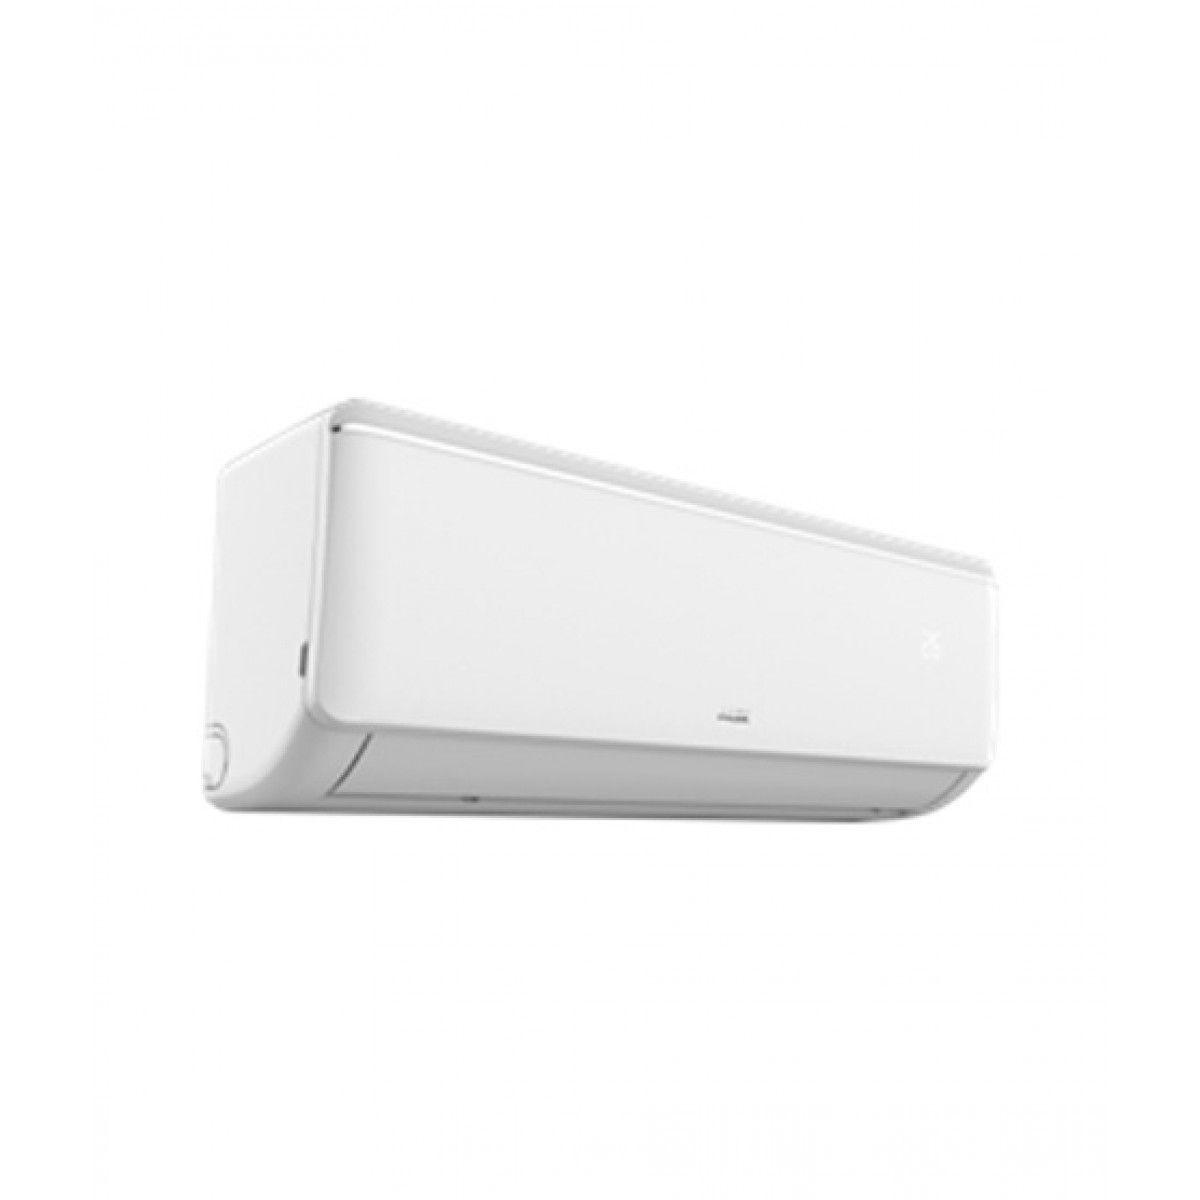 PEL Majestic E52 Split Air Conditioner 1.0 Ton (PSAC-12K)